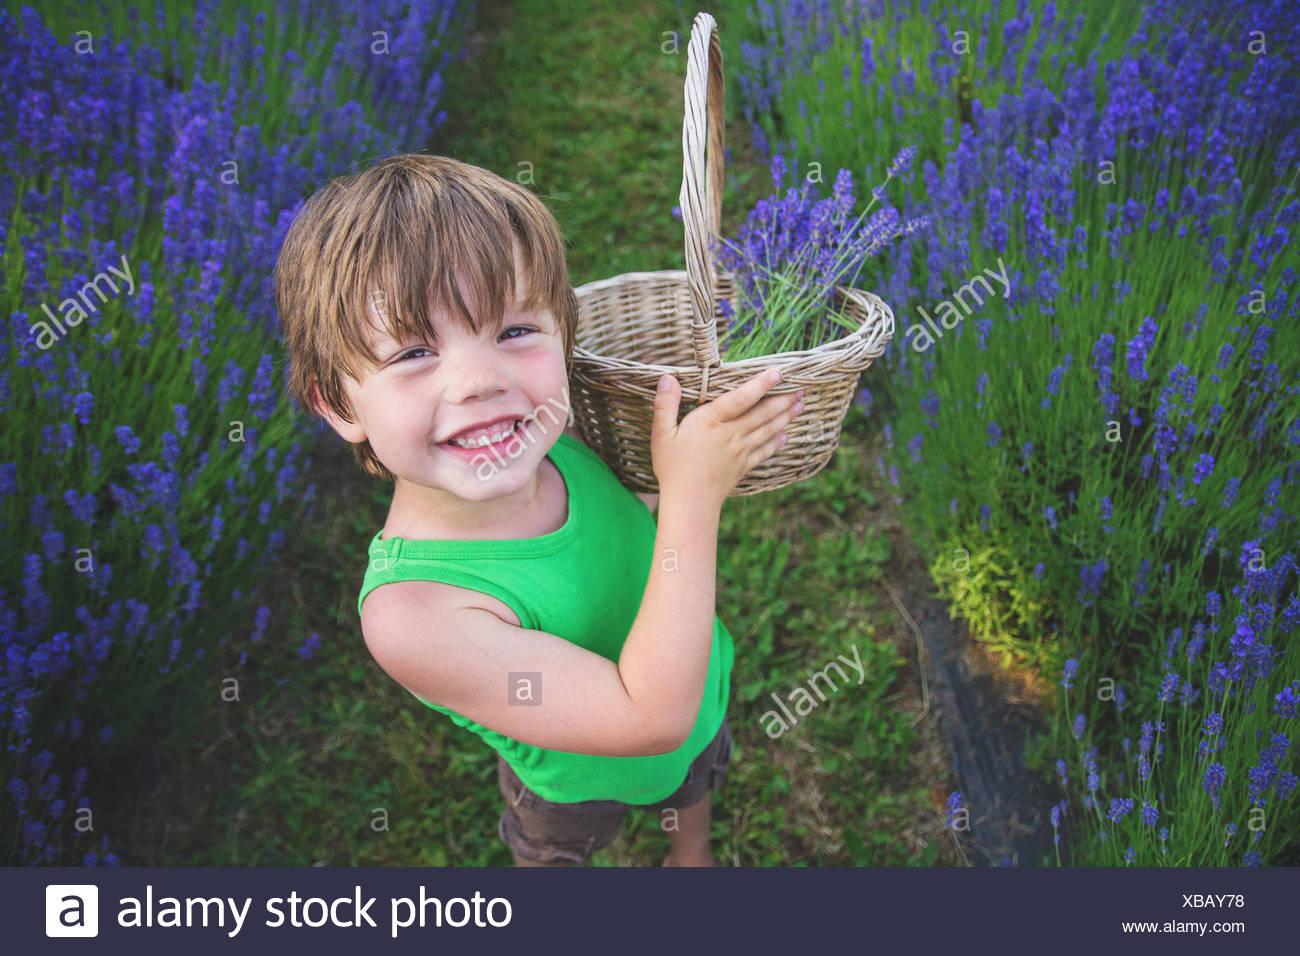 Boy picking lavender in lavender field - Stock Image